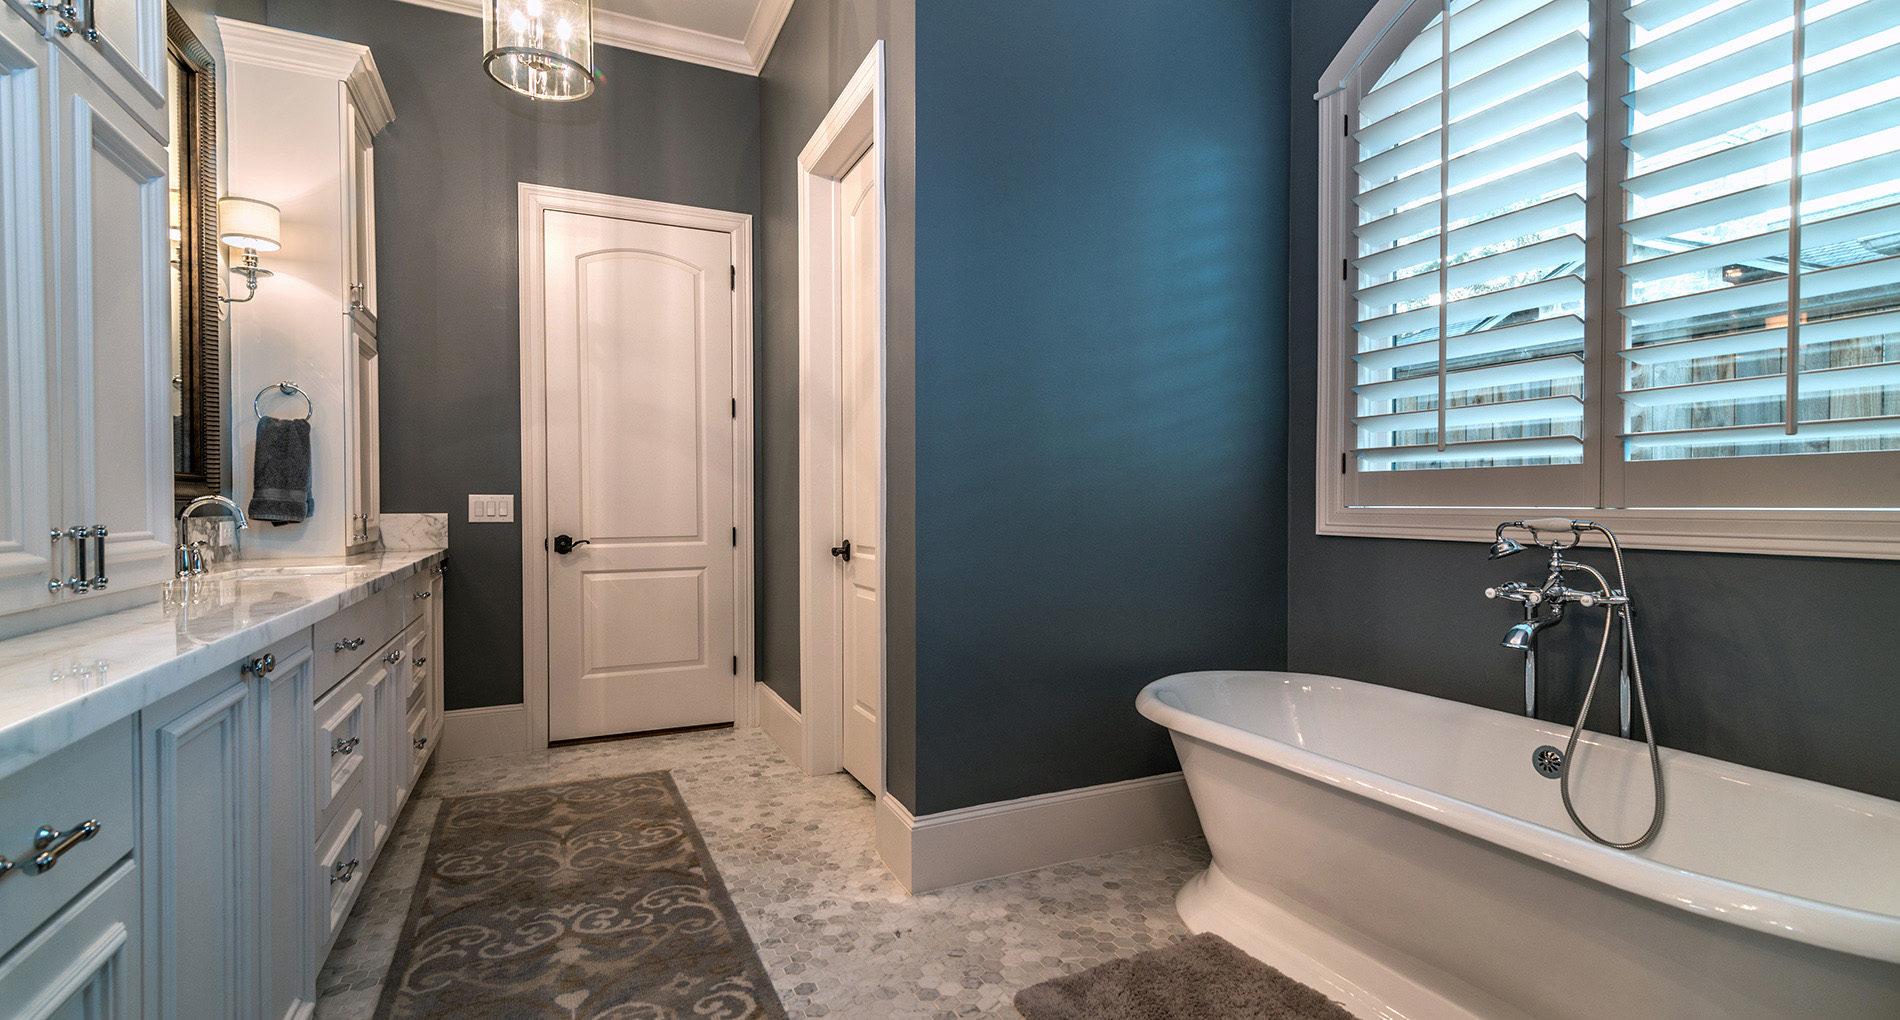 Bathroom Remodel Longmont Pinechase Slider